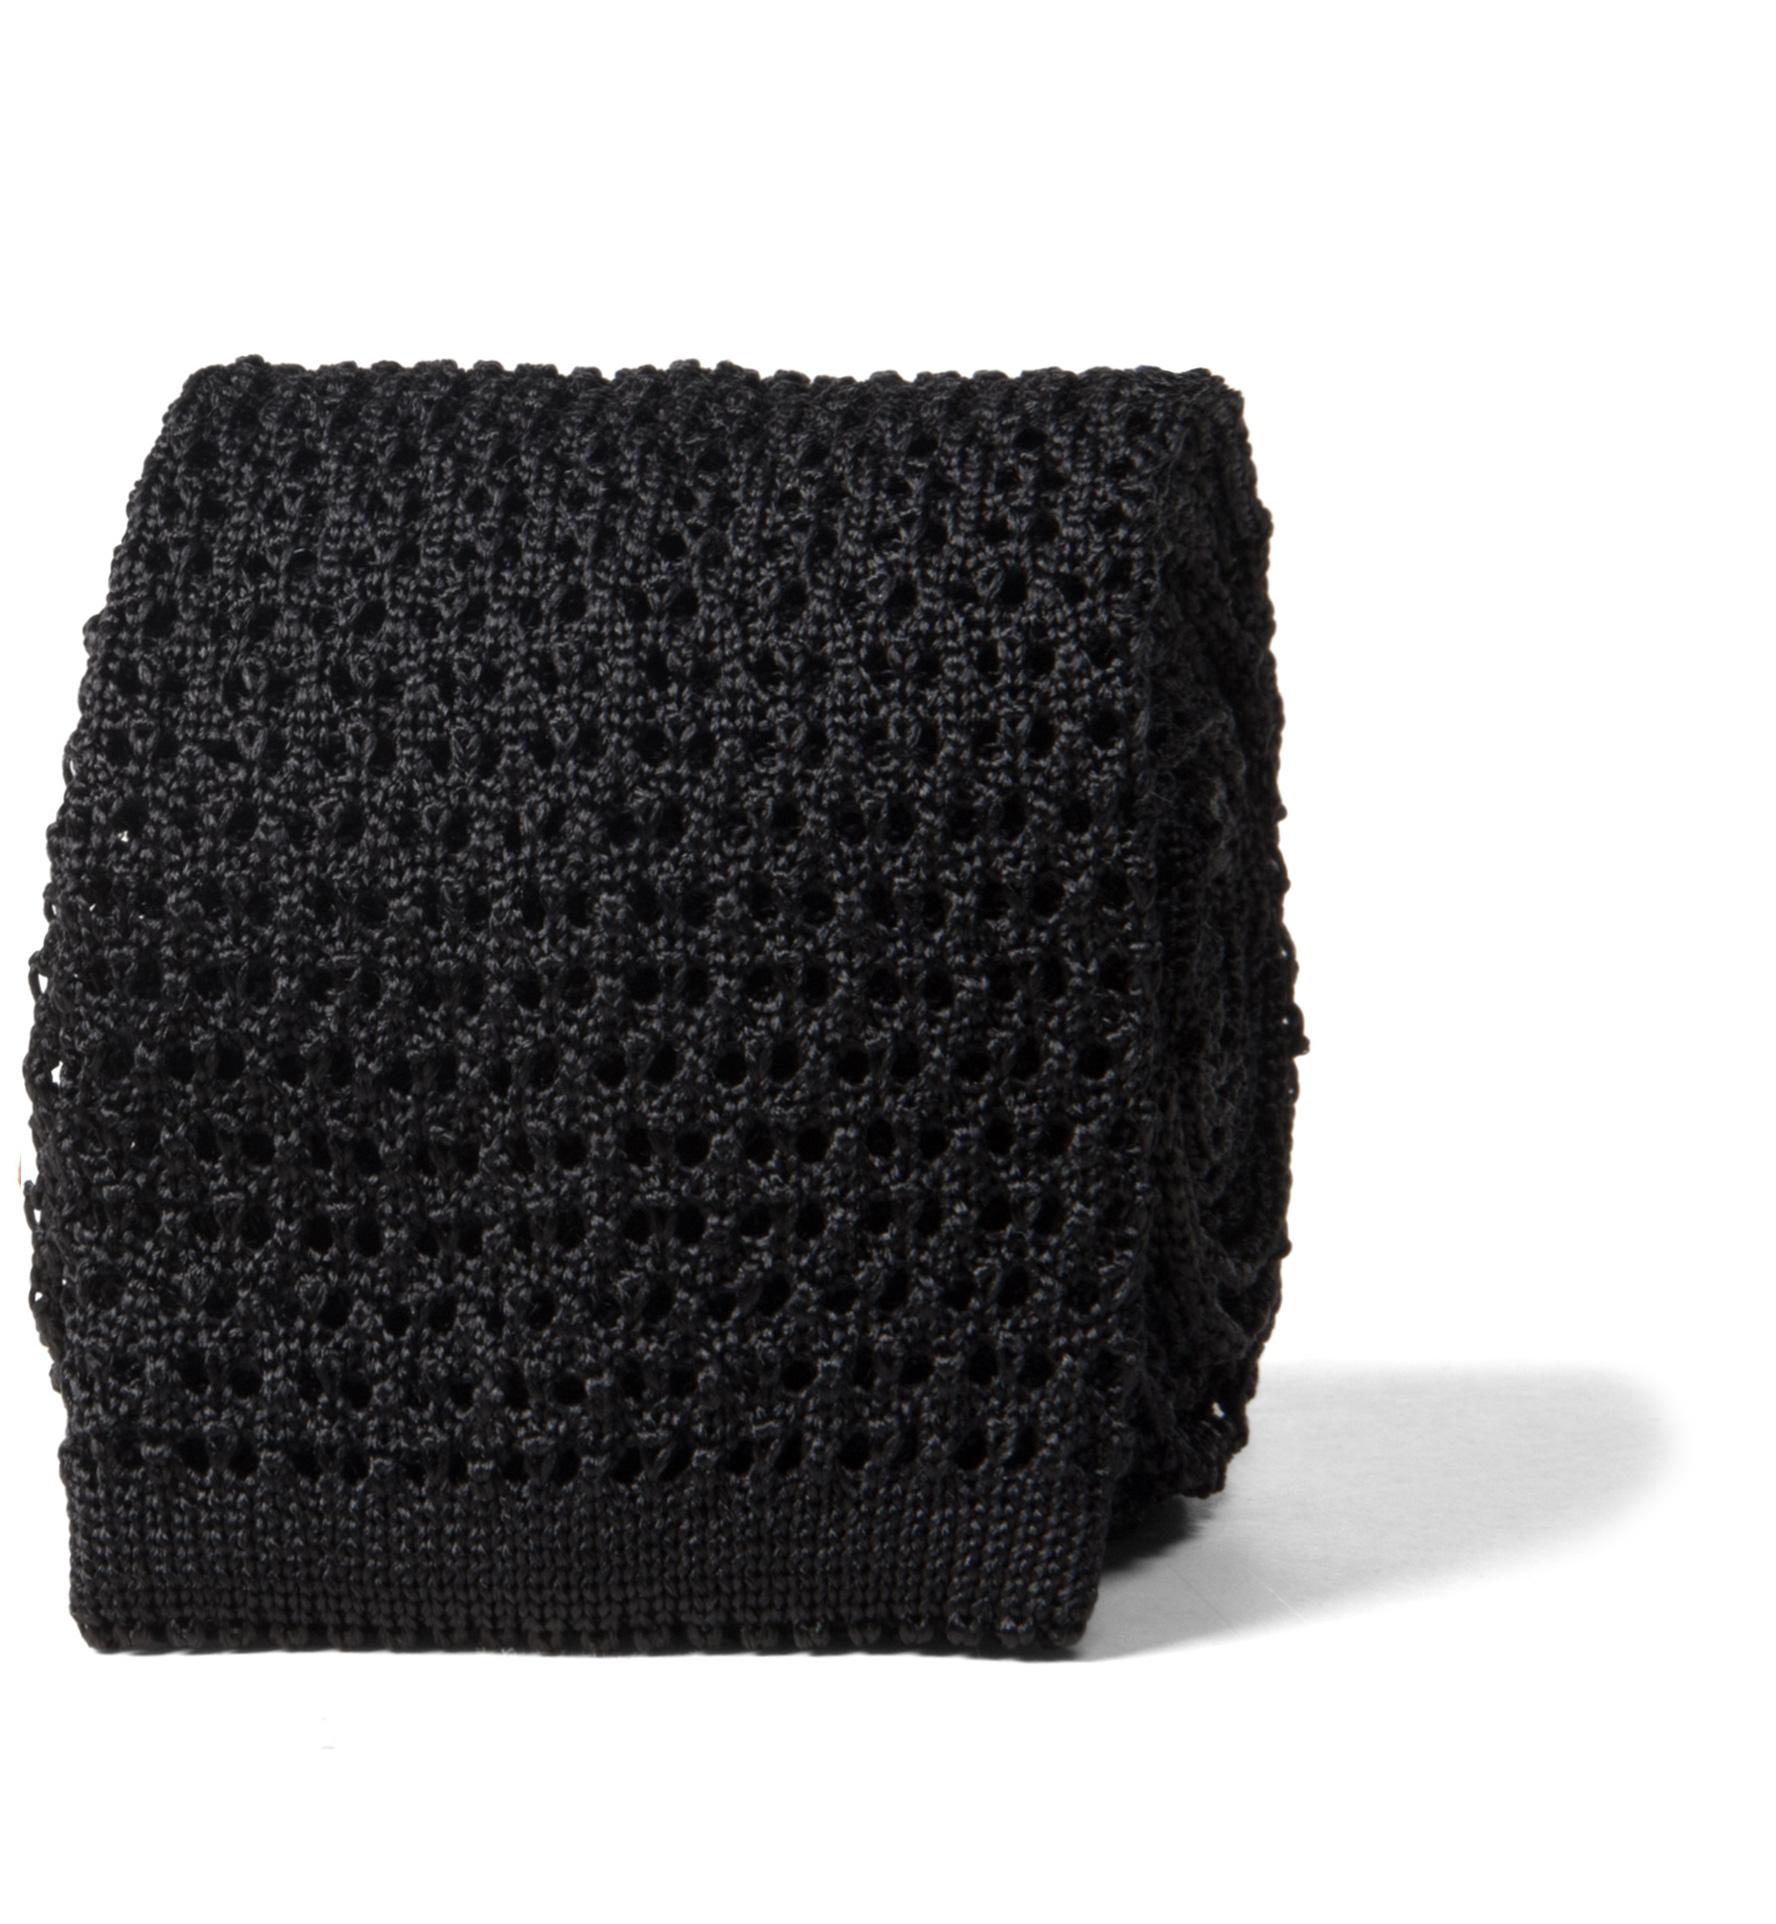 Zoom Image of Black Silk Knit Tie